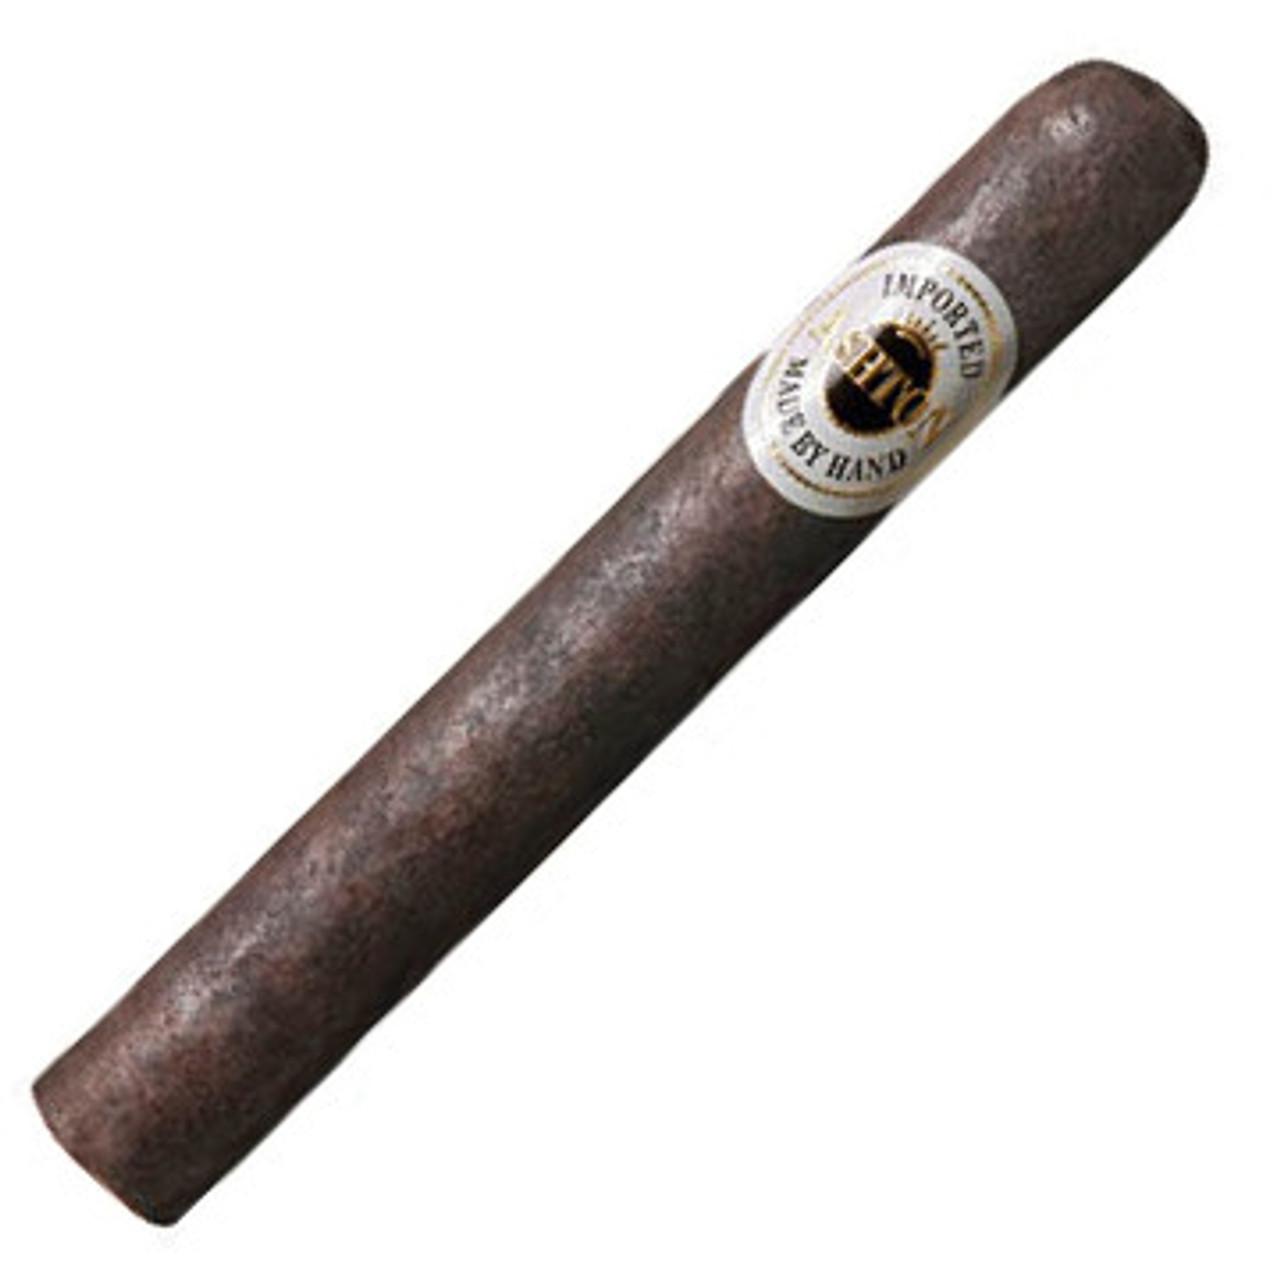 Ashton Aged Maduro No. 40 Cigars - 6 x 50 (Cedar Chest of 25)